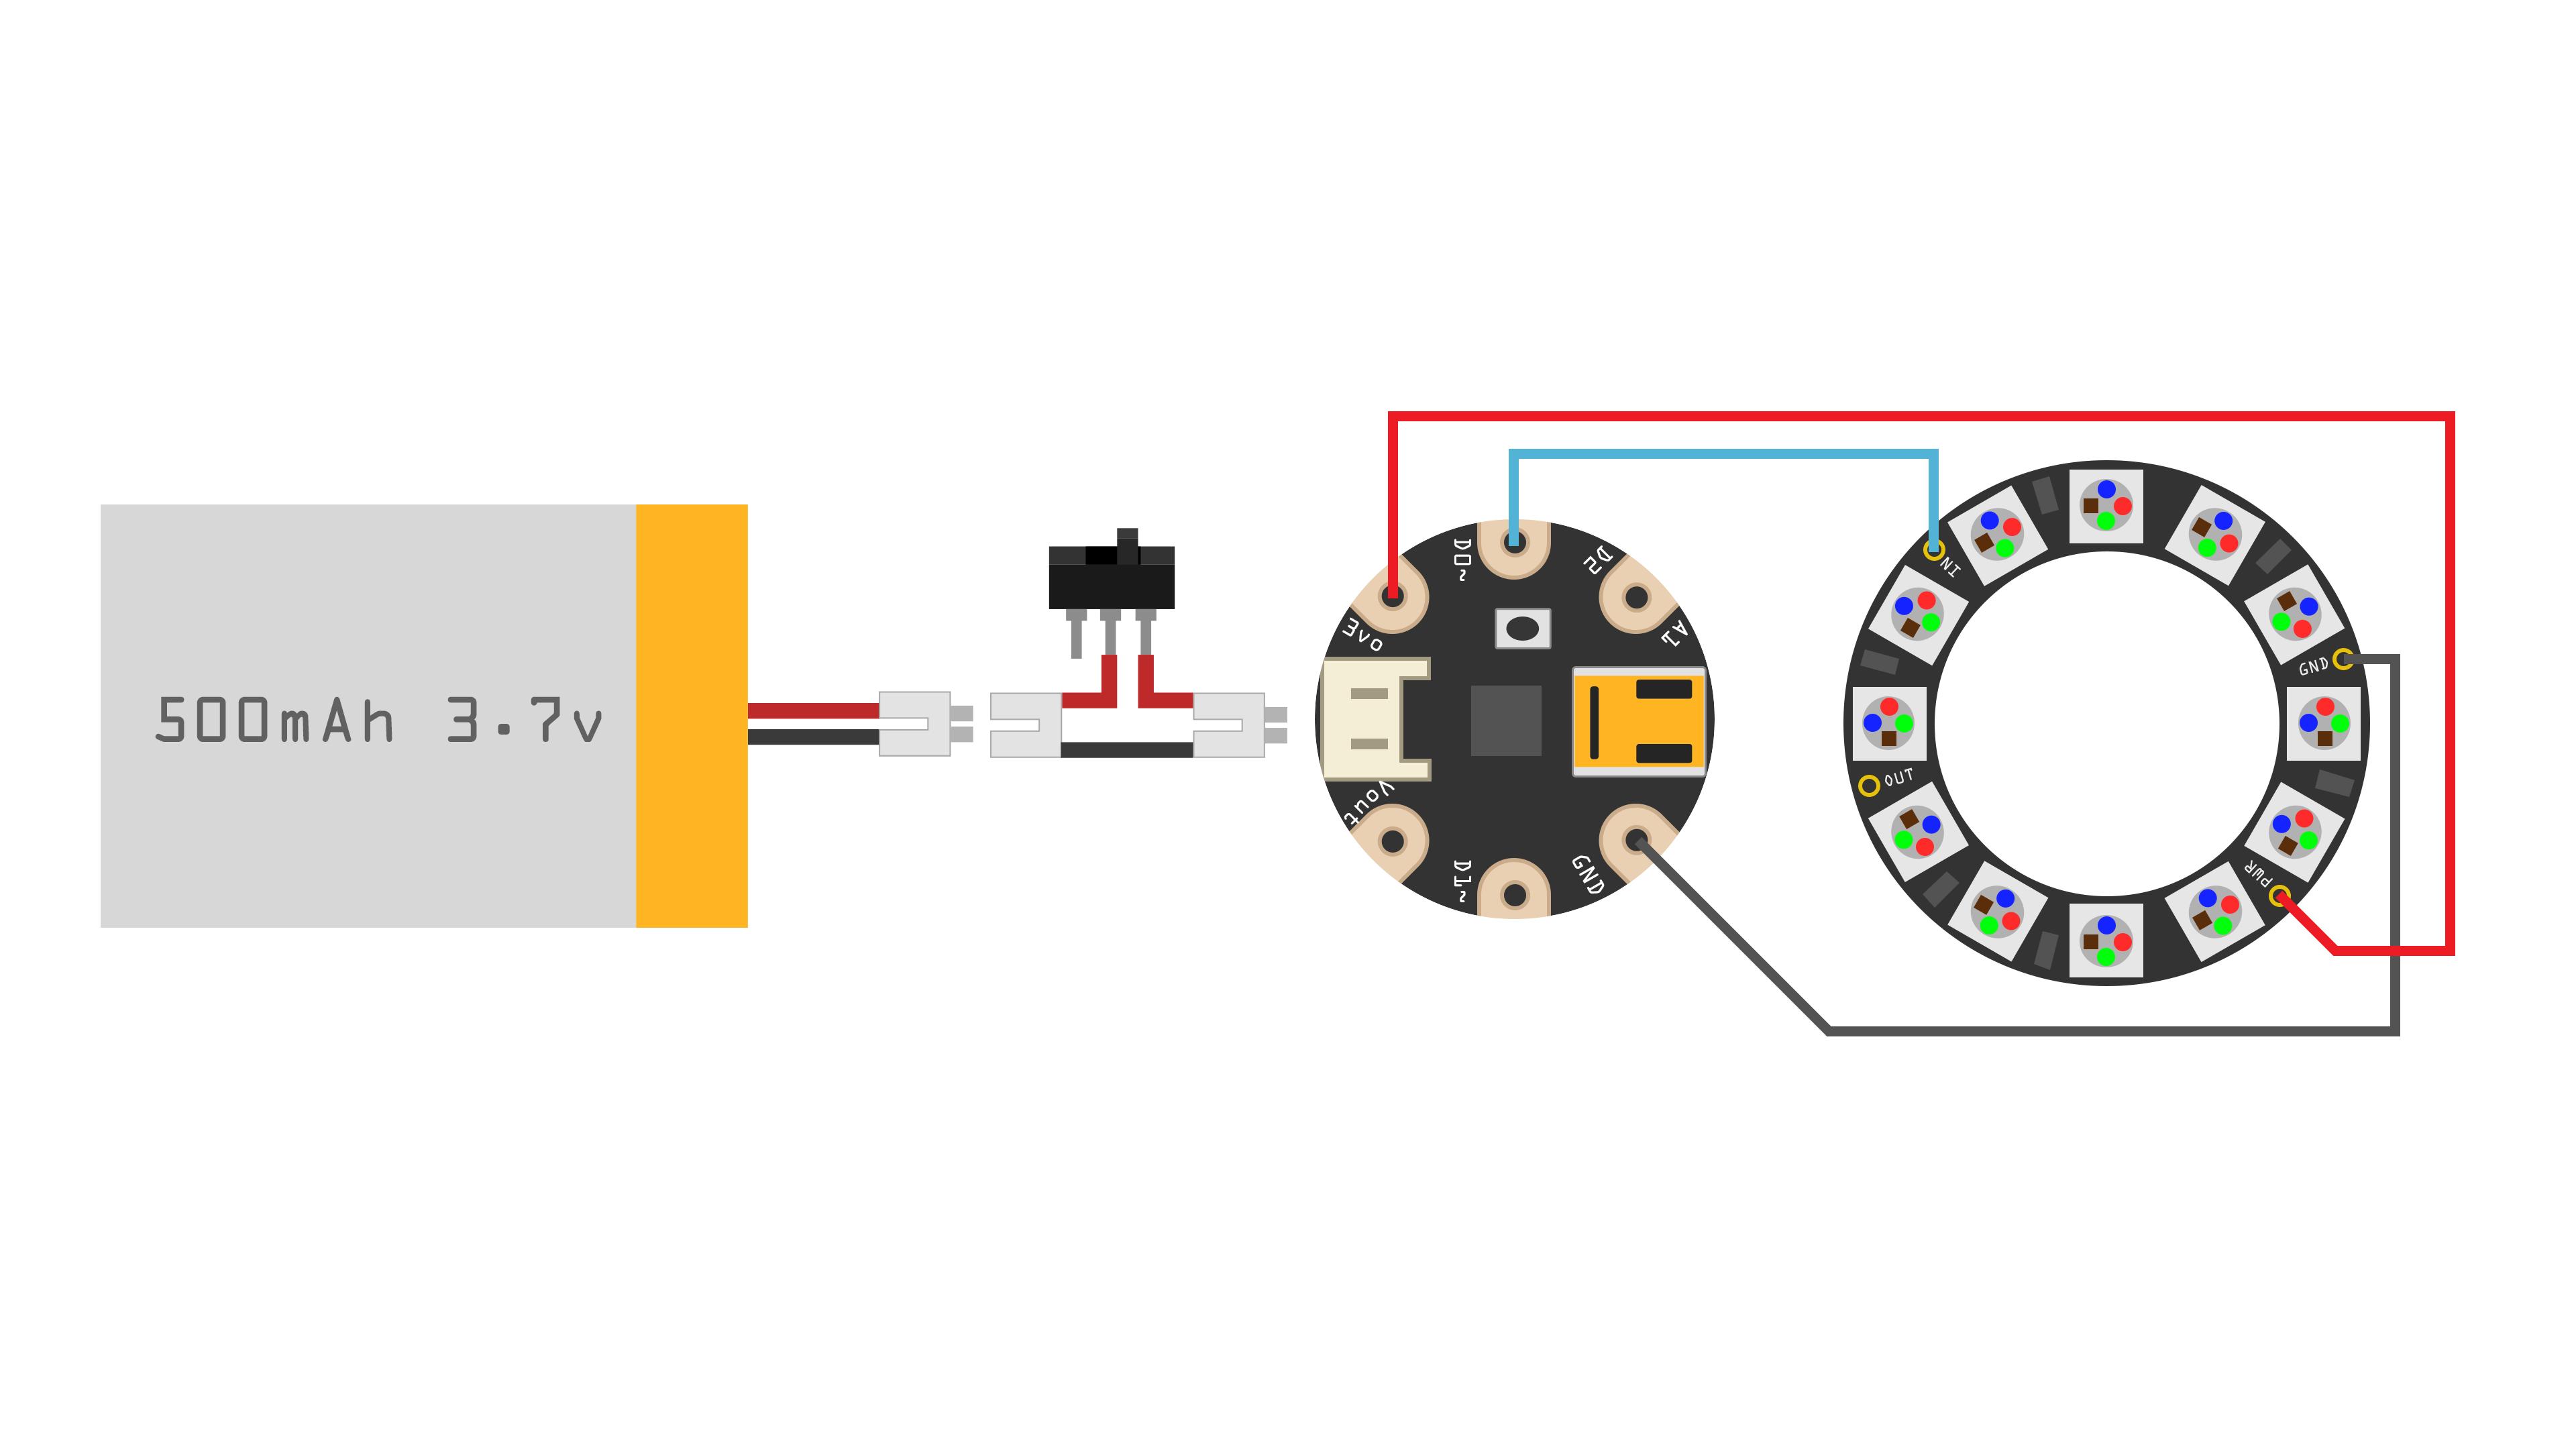 3d_printing_horns-circuit-diagram-gemma.png